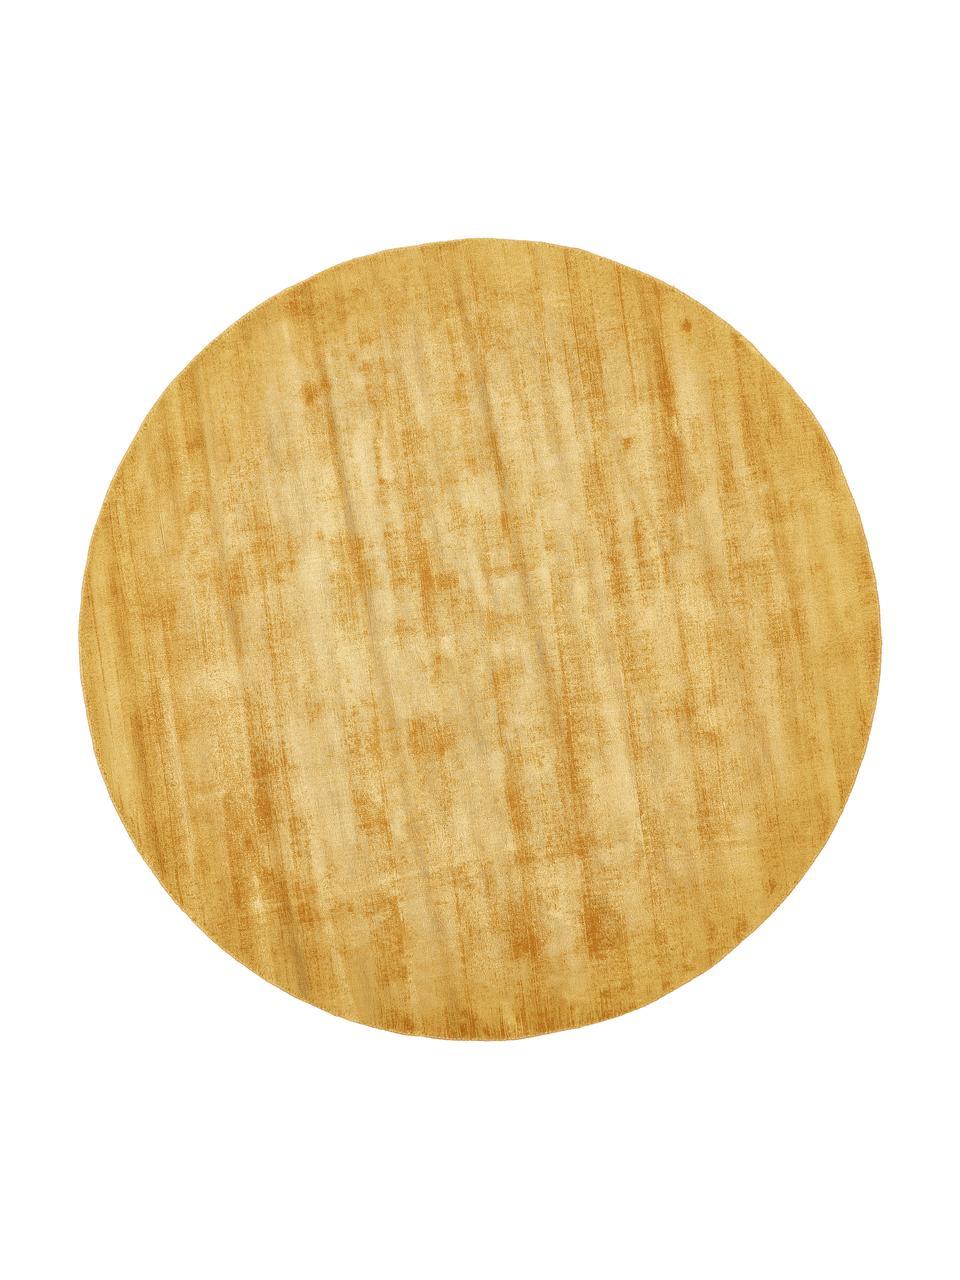 Runder Viskoseteppich Jane in Senfgelb, handgewebt, Flor: 100% Viskose, Senfgelb, Ø 115 cm (Größe S)